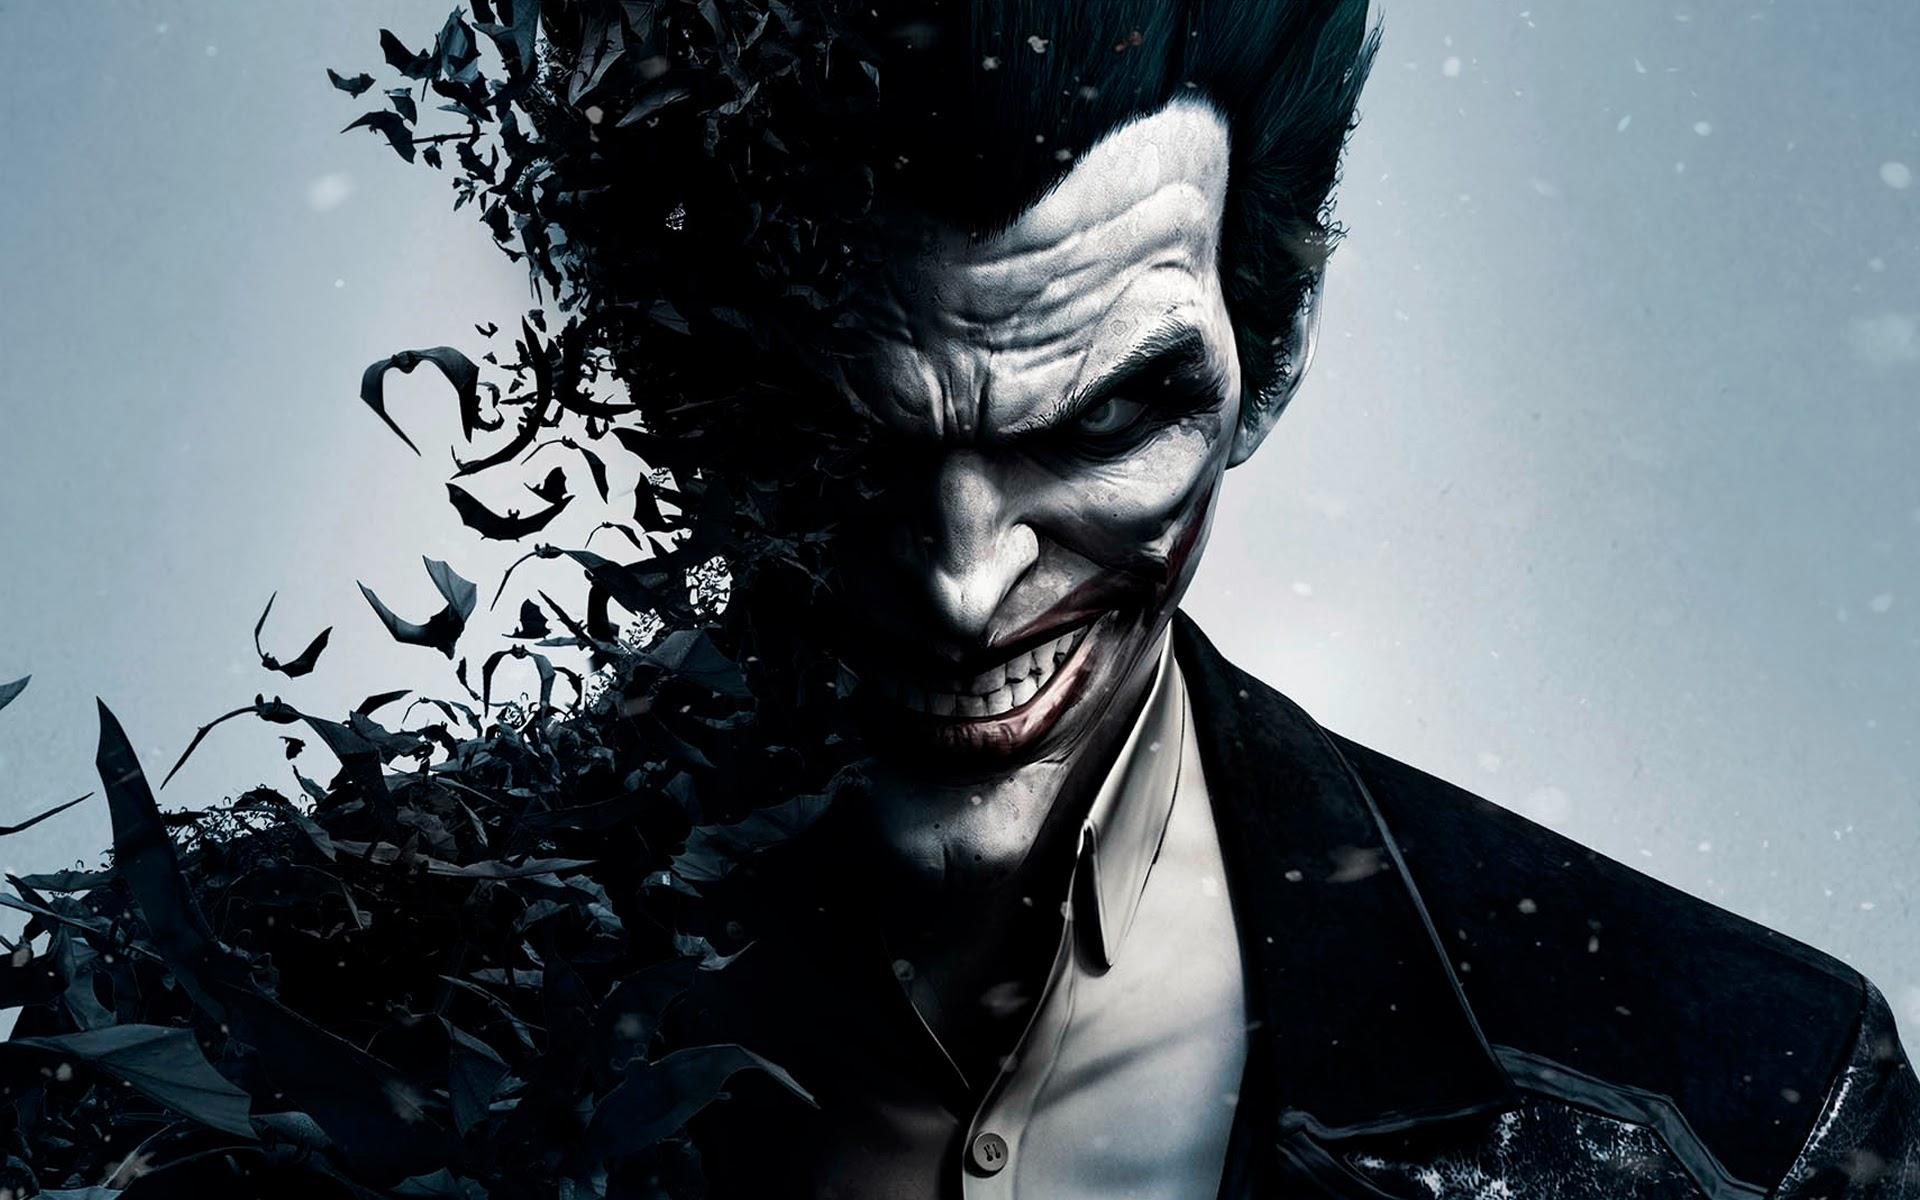 joker batman arkham origins grin smile video game 1920x1200 widescreen 1920x1200